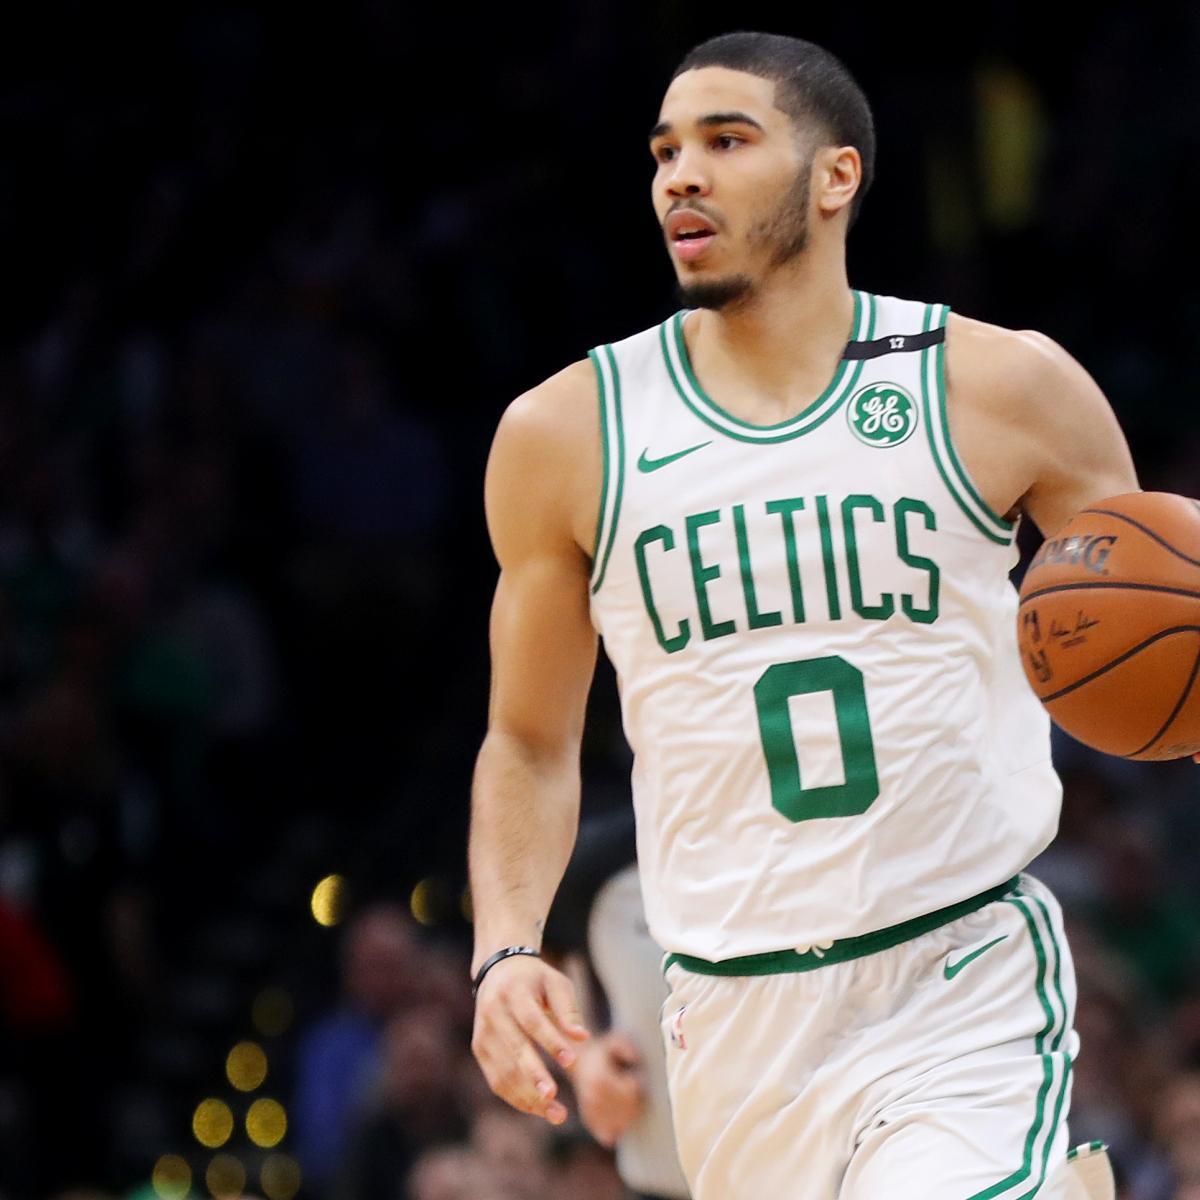 Celtics Rumors: Jayson Tatum Was Not Made Available in Anthony Davis Trade Talks